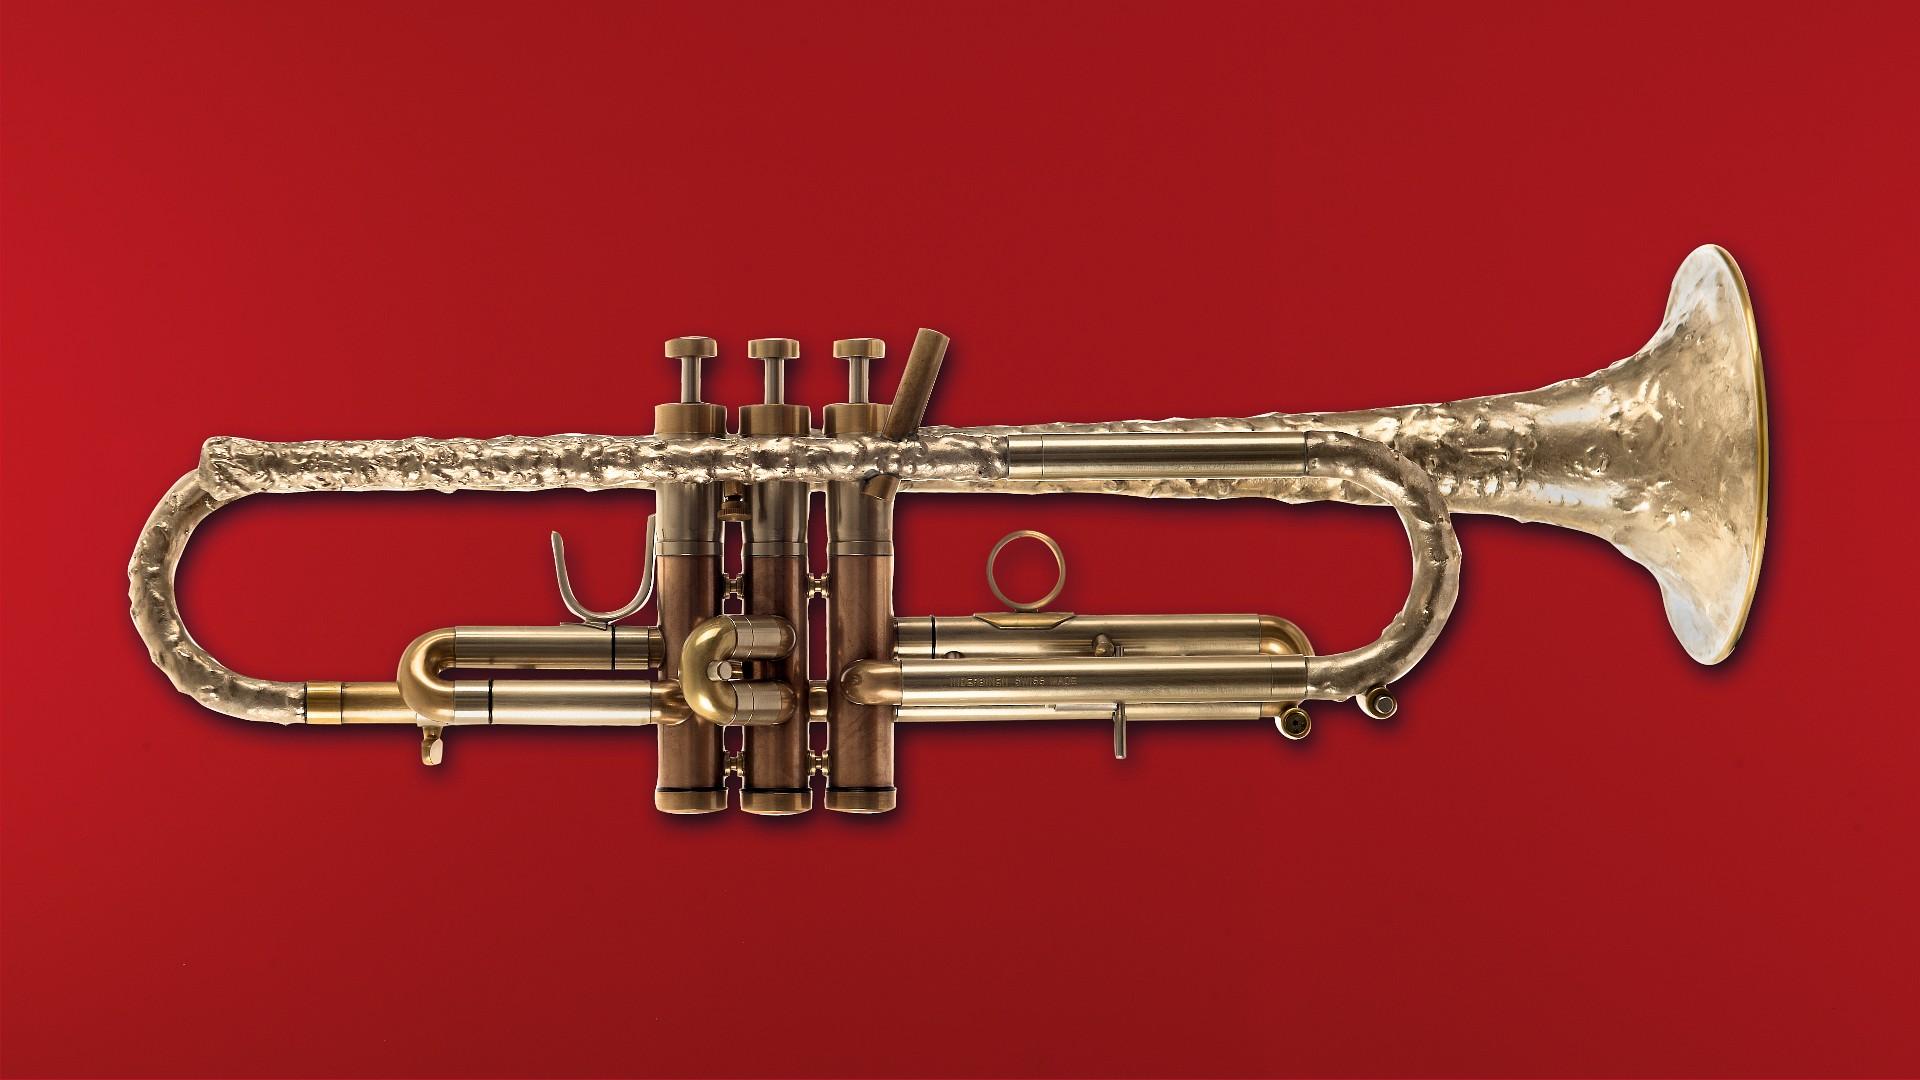 trompete_silverart_r_1920x1080px